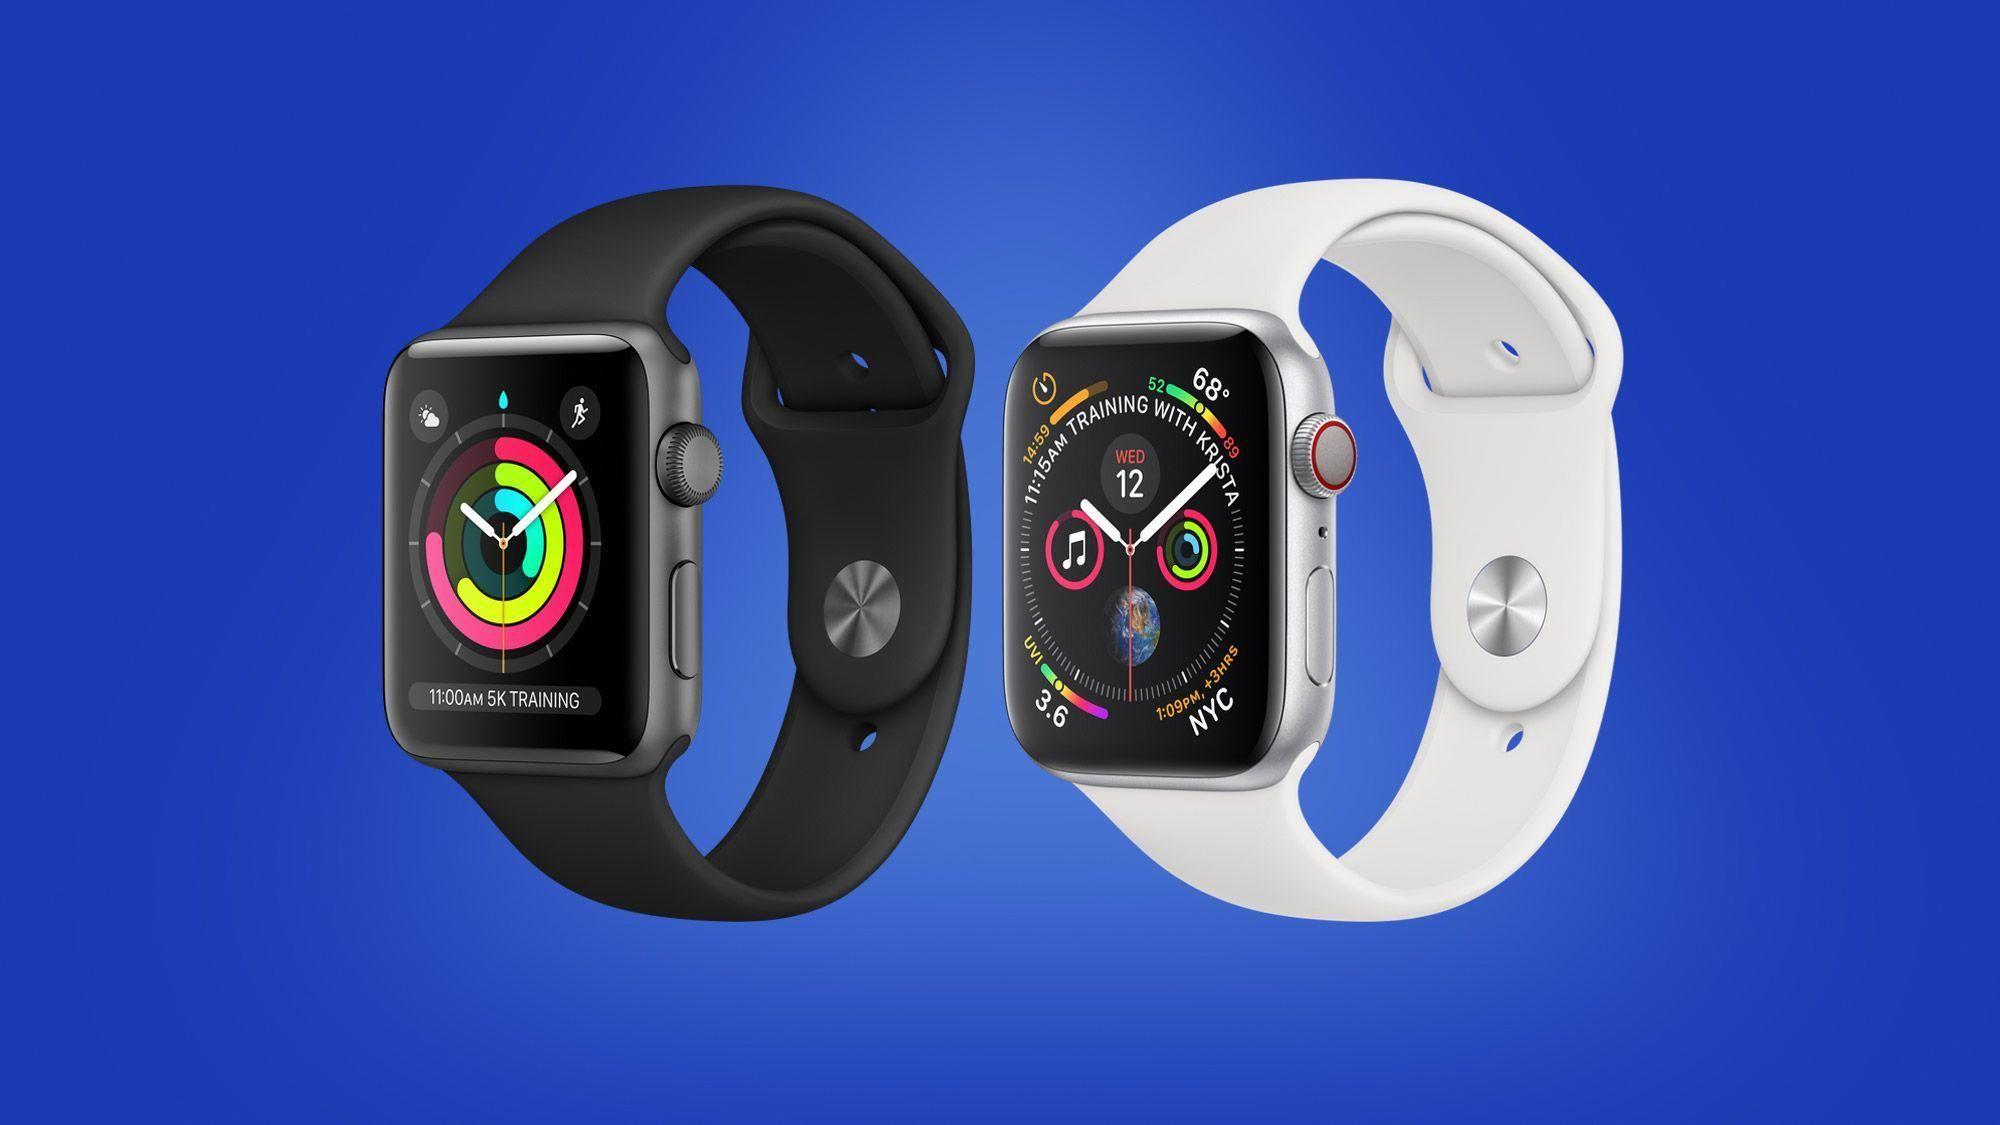 Apple Watch Sale At Walmart Pre Black Friday Deals On The Apple Watch 3 And 4 Apple Deals Friday Pre In 2020 Apple Watch Apple Watch Black Friday Best Apple Watch